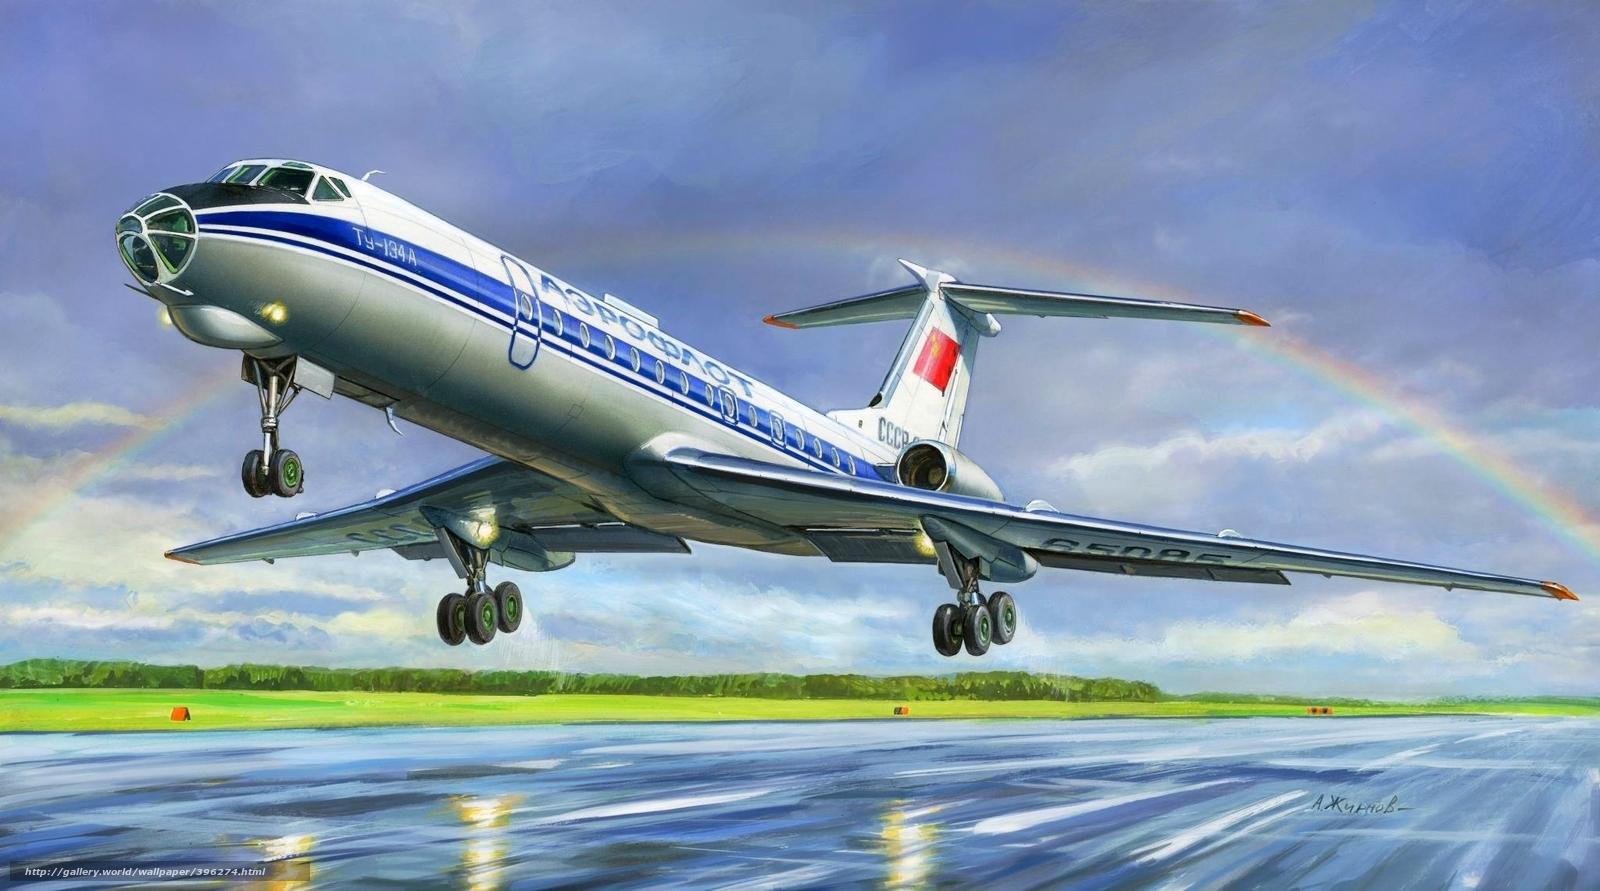 Download wallpaper picture,  A.Zhirnov,  passenger,  plane free desktop wallpaper in the resolution 2048x1141 — picture №396274